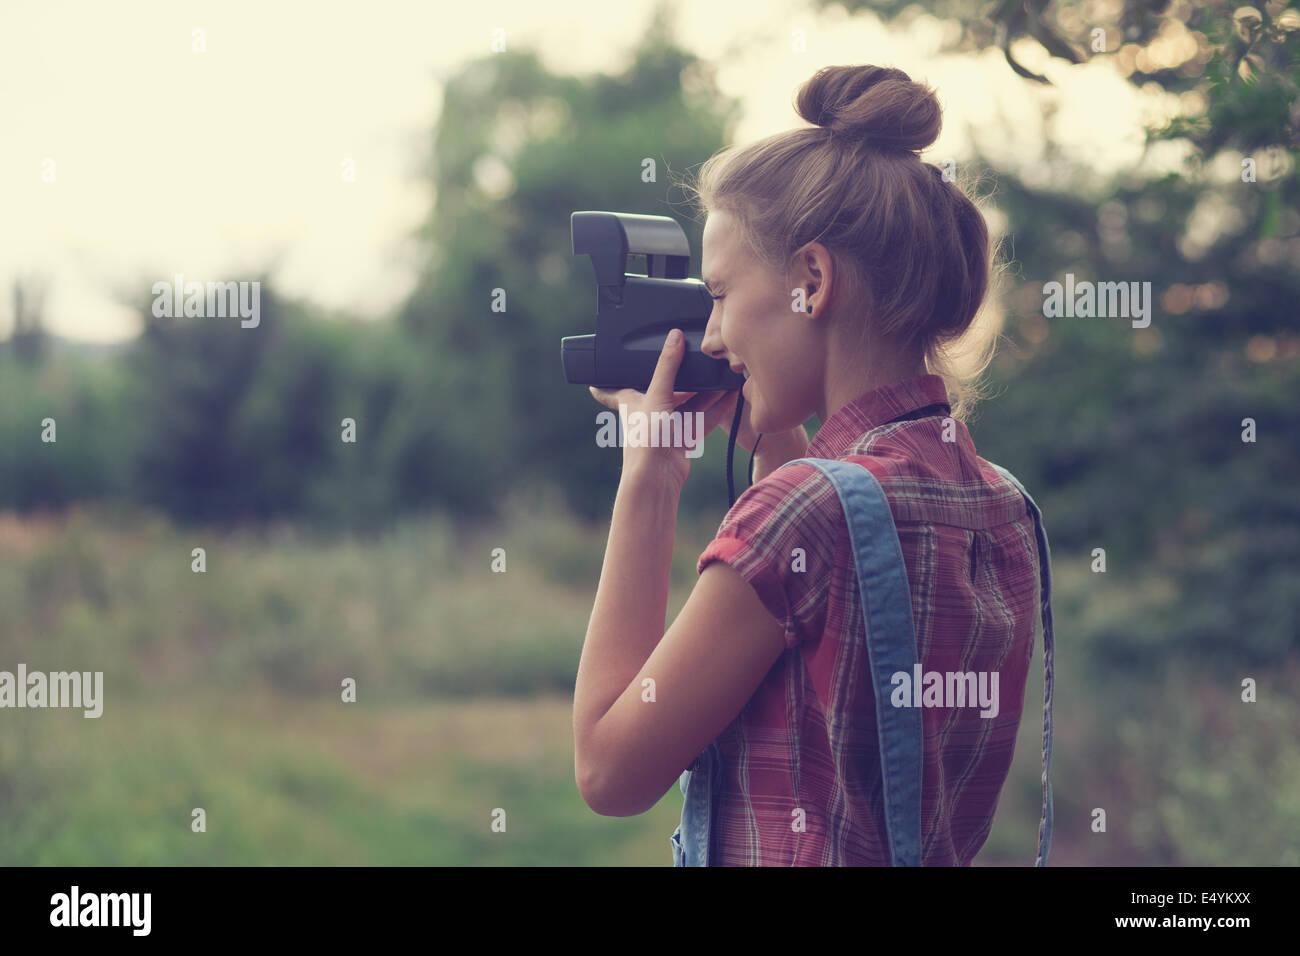 Girl photographer shooting outdoors - Stock Image